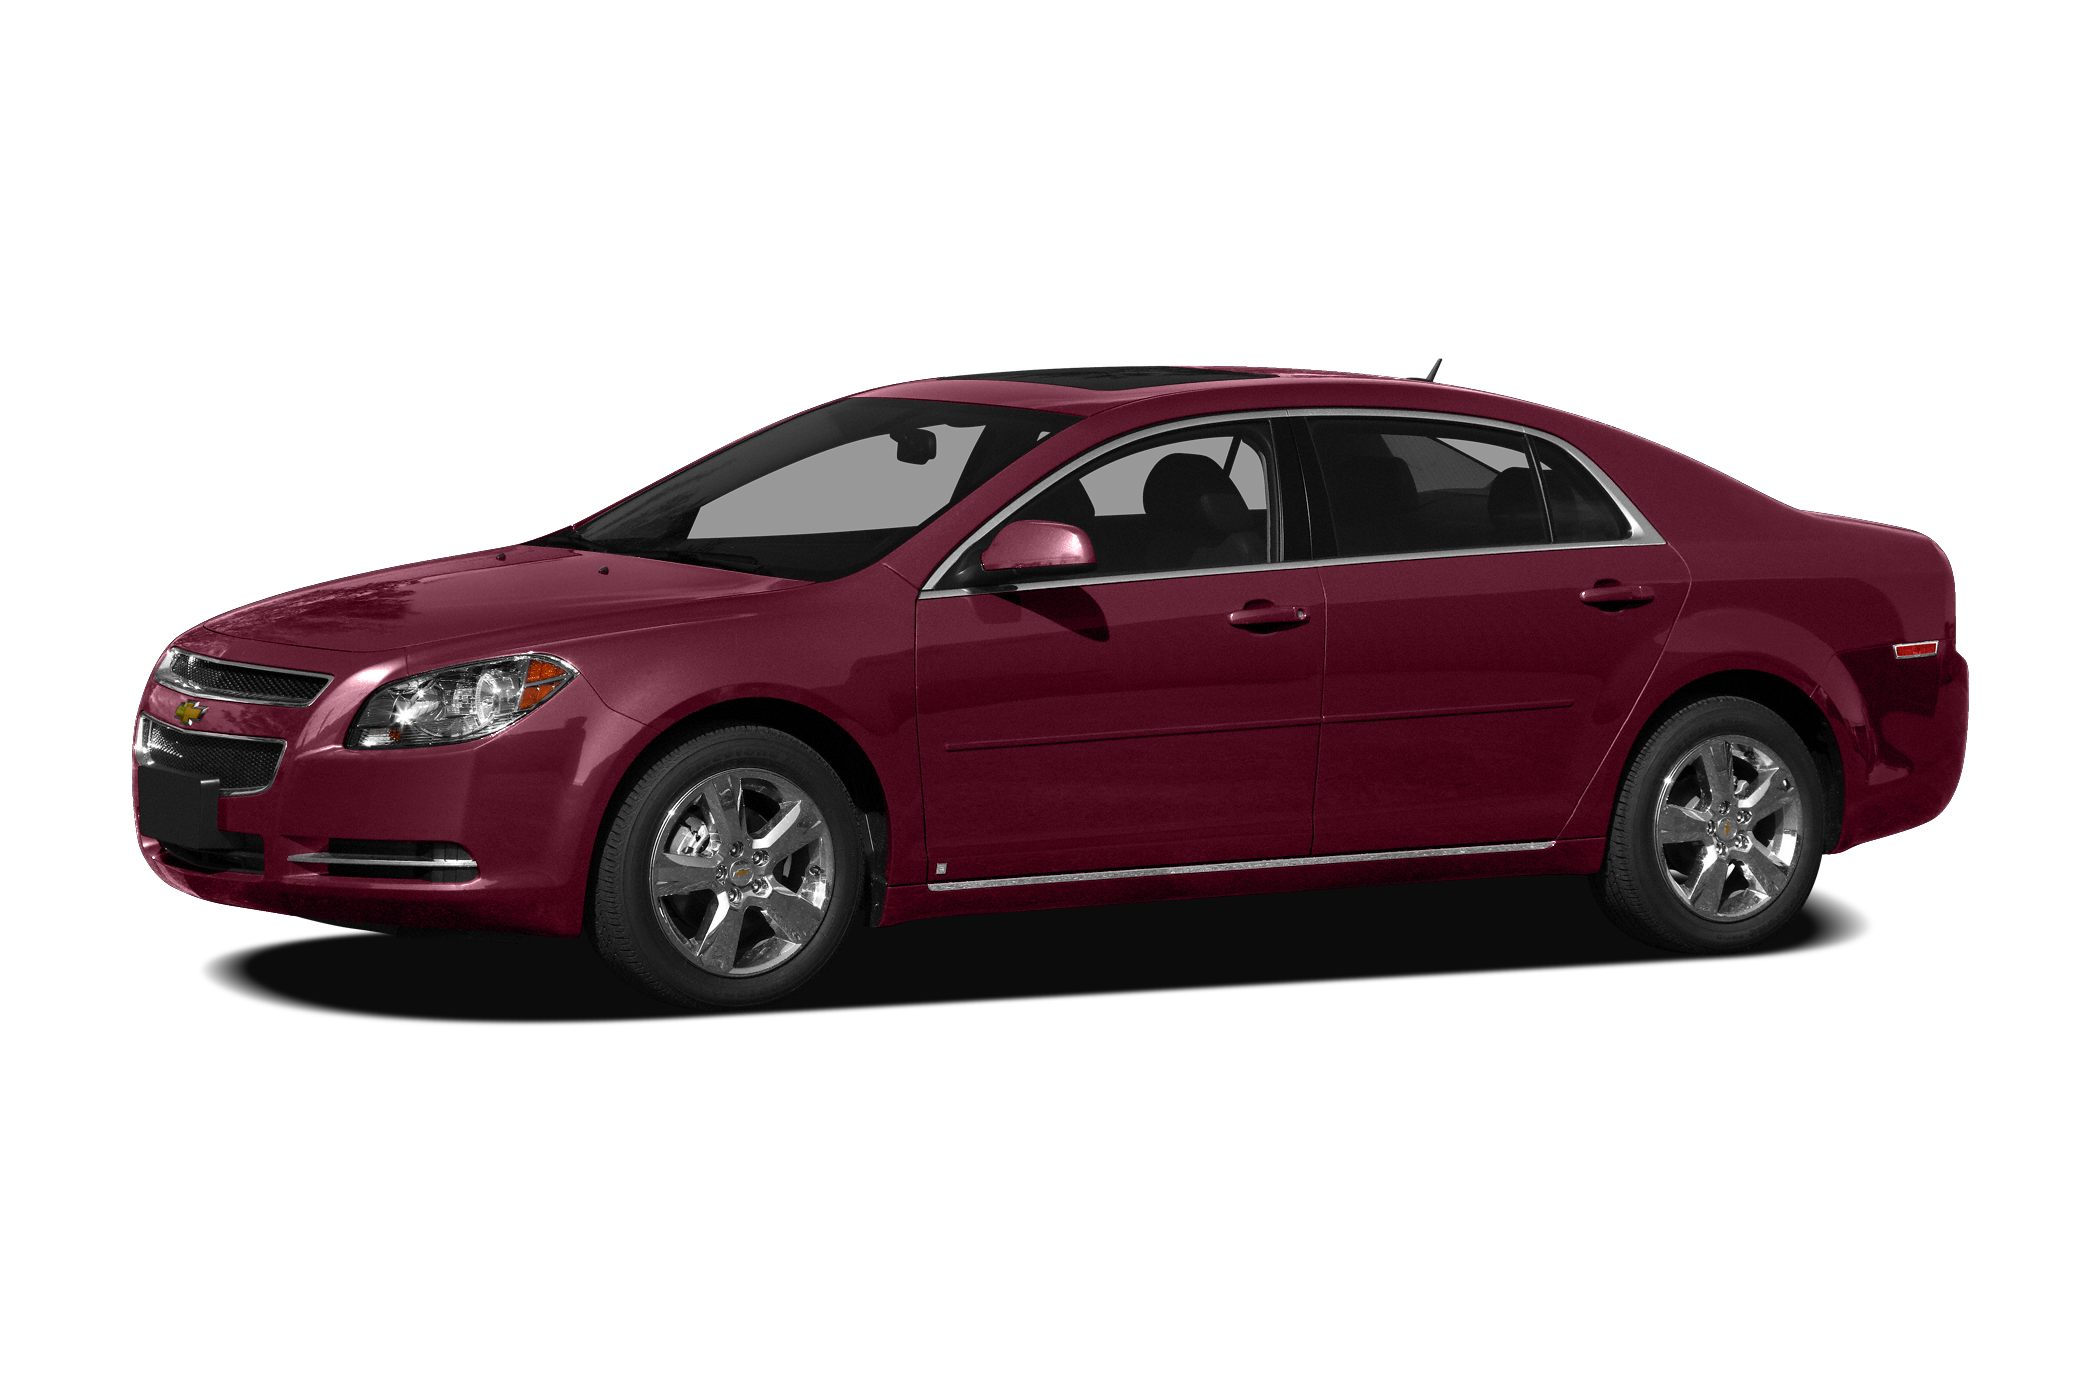 2010 Chevrolet Malibu Recalls